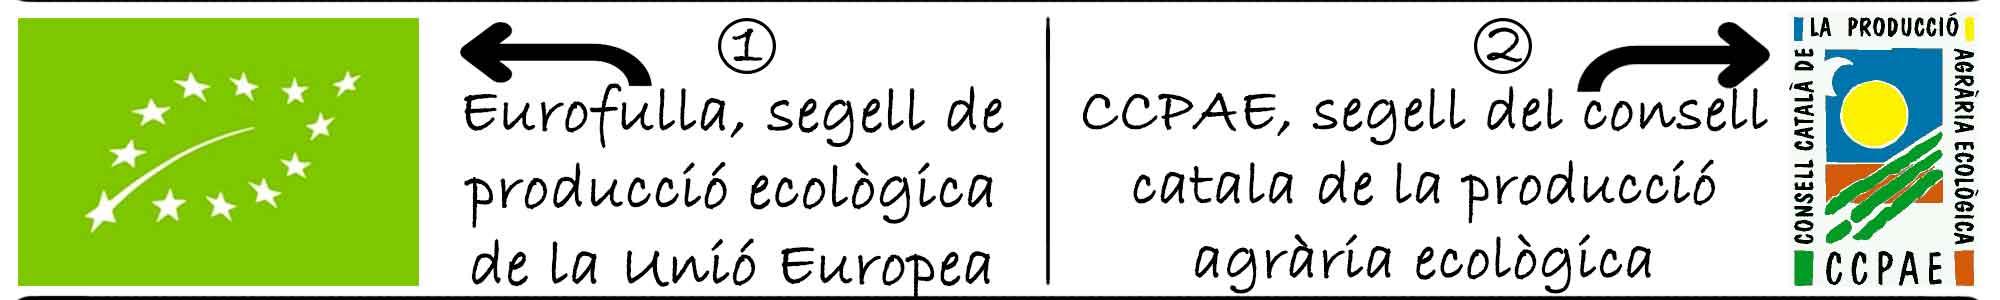 logo ecologic europa catalunya ccpae